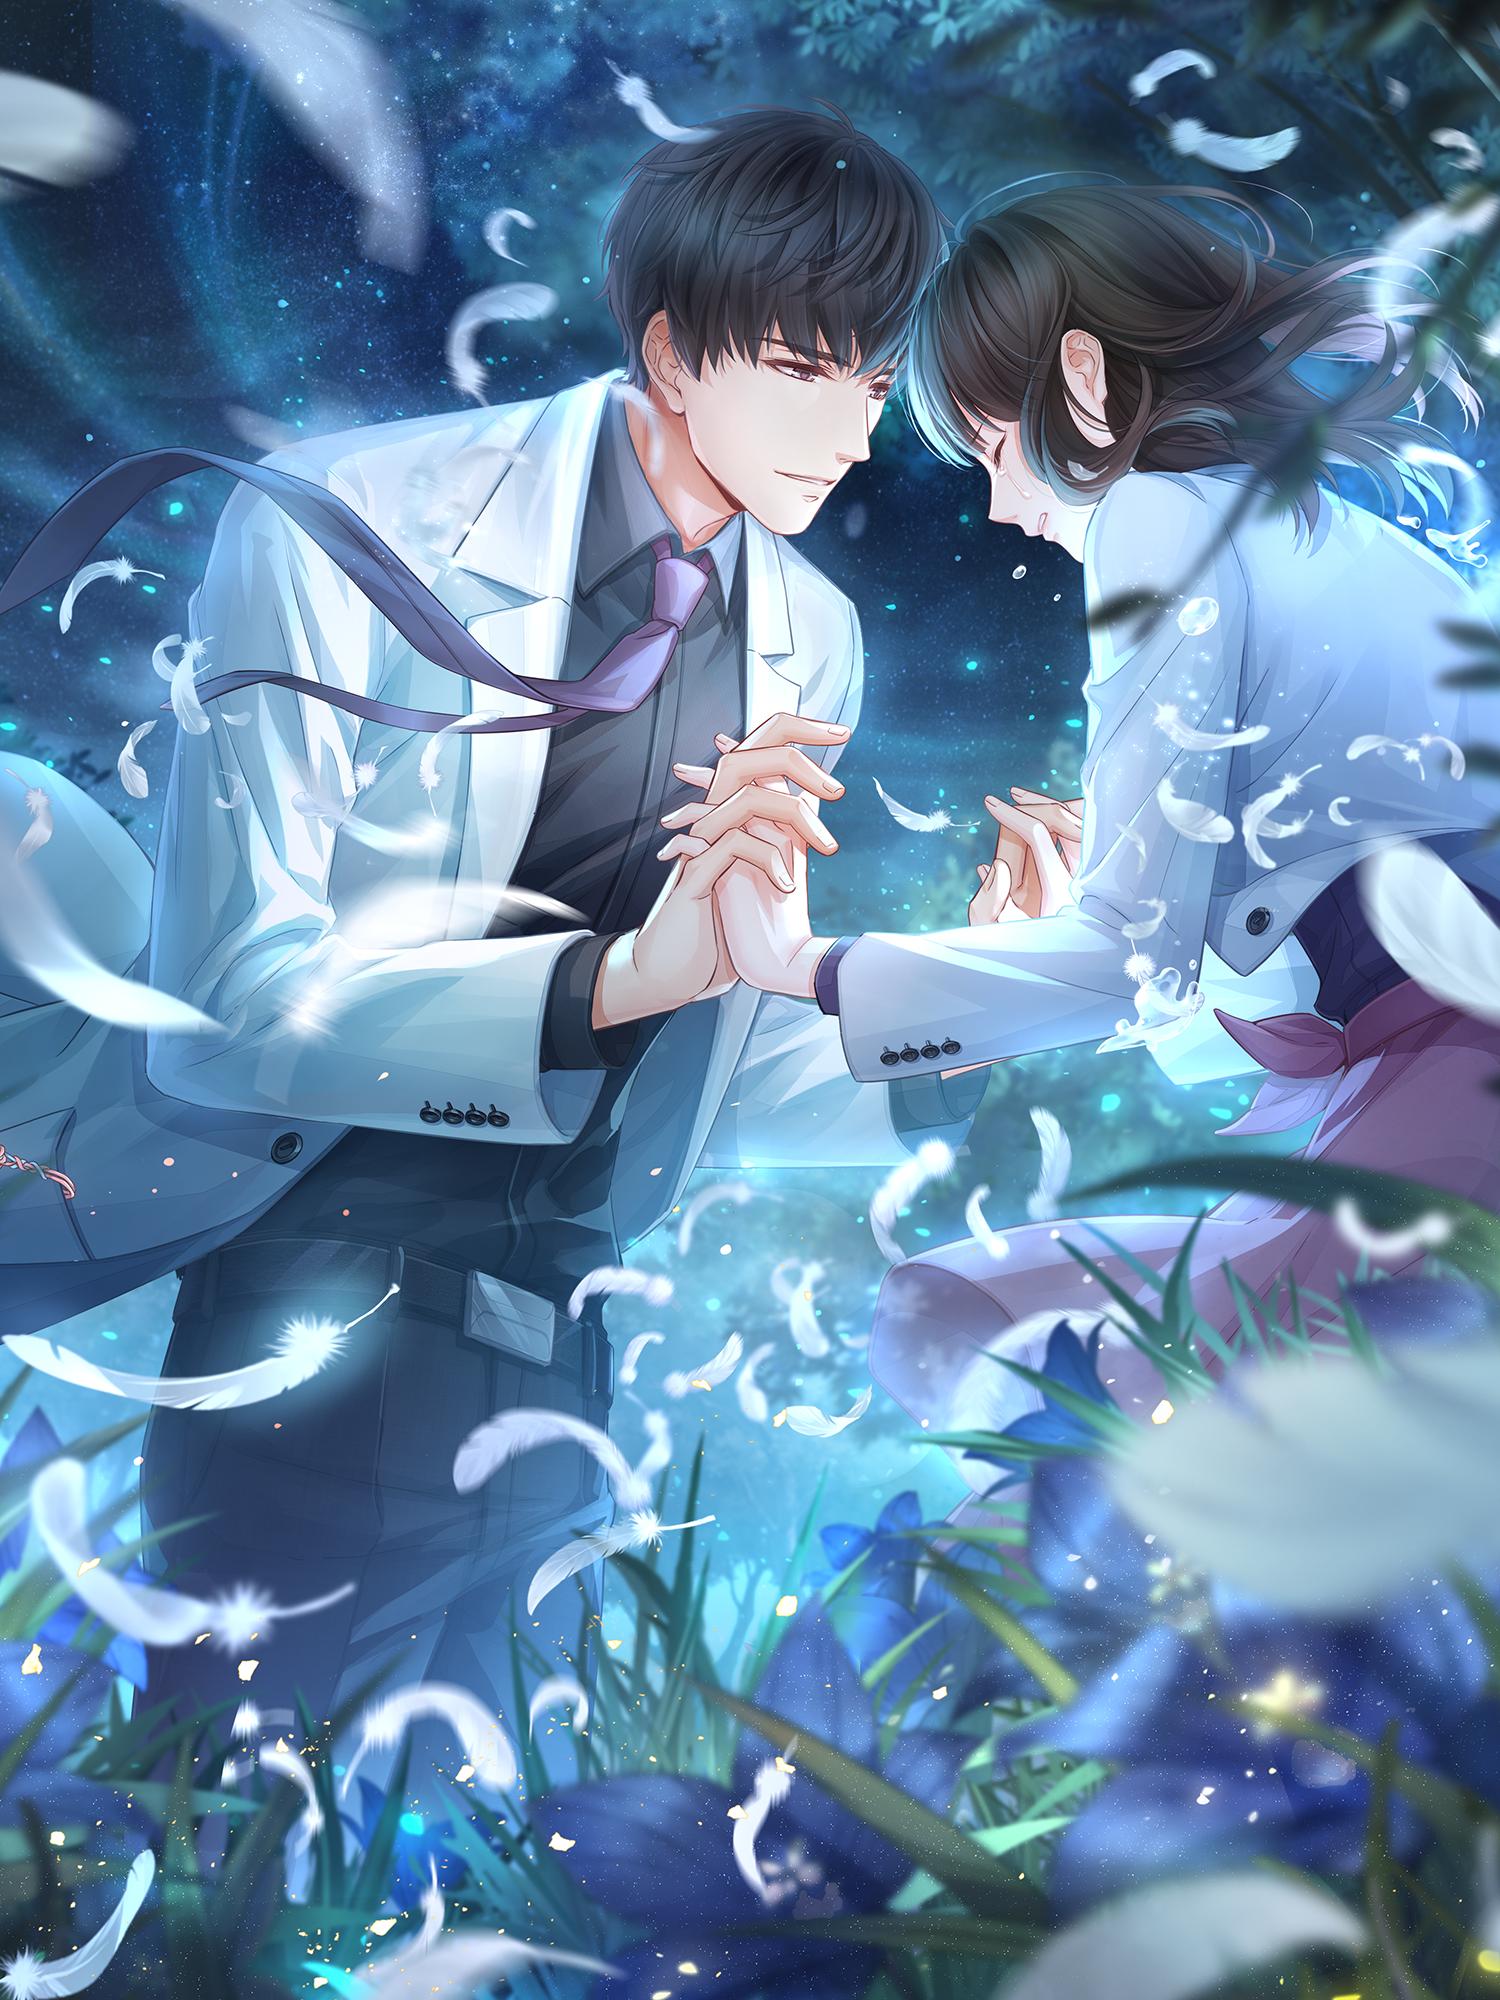 Mrlovequeenschoice Loveandproducer Mlqc In 2020 Romantic Anime Anime Love Anime Romance